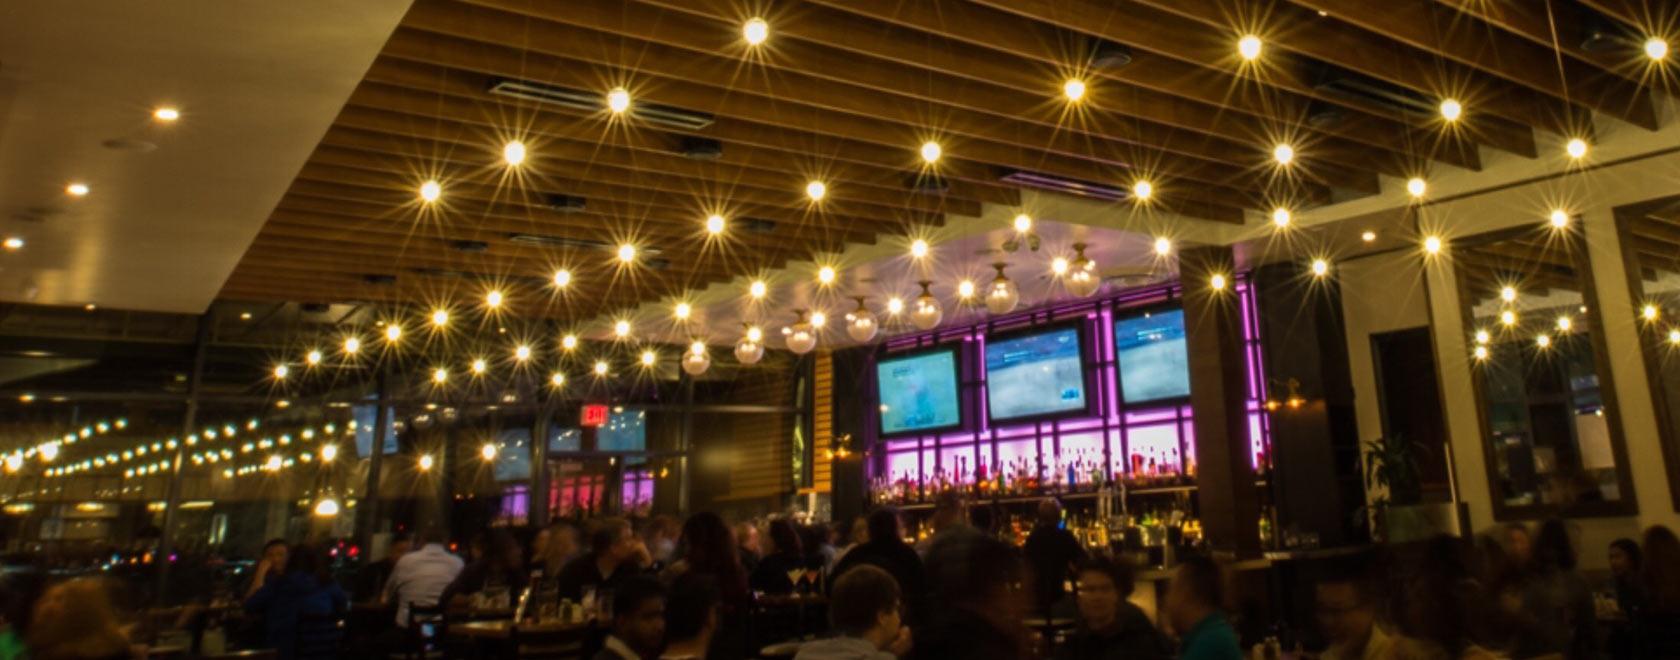 Jack's Newark bar